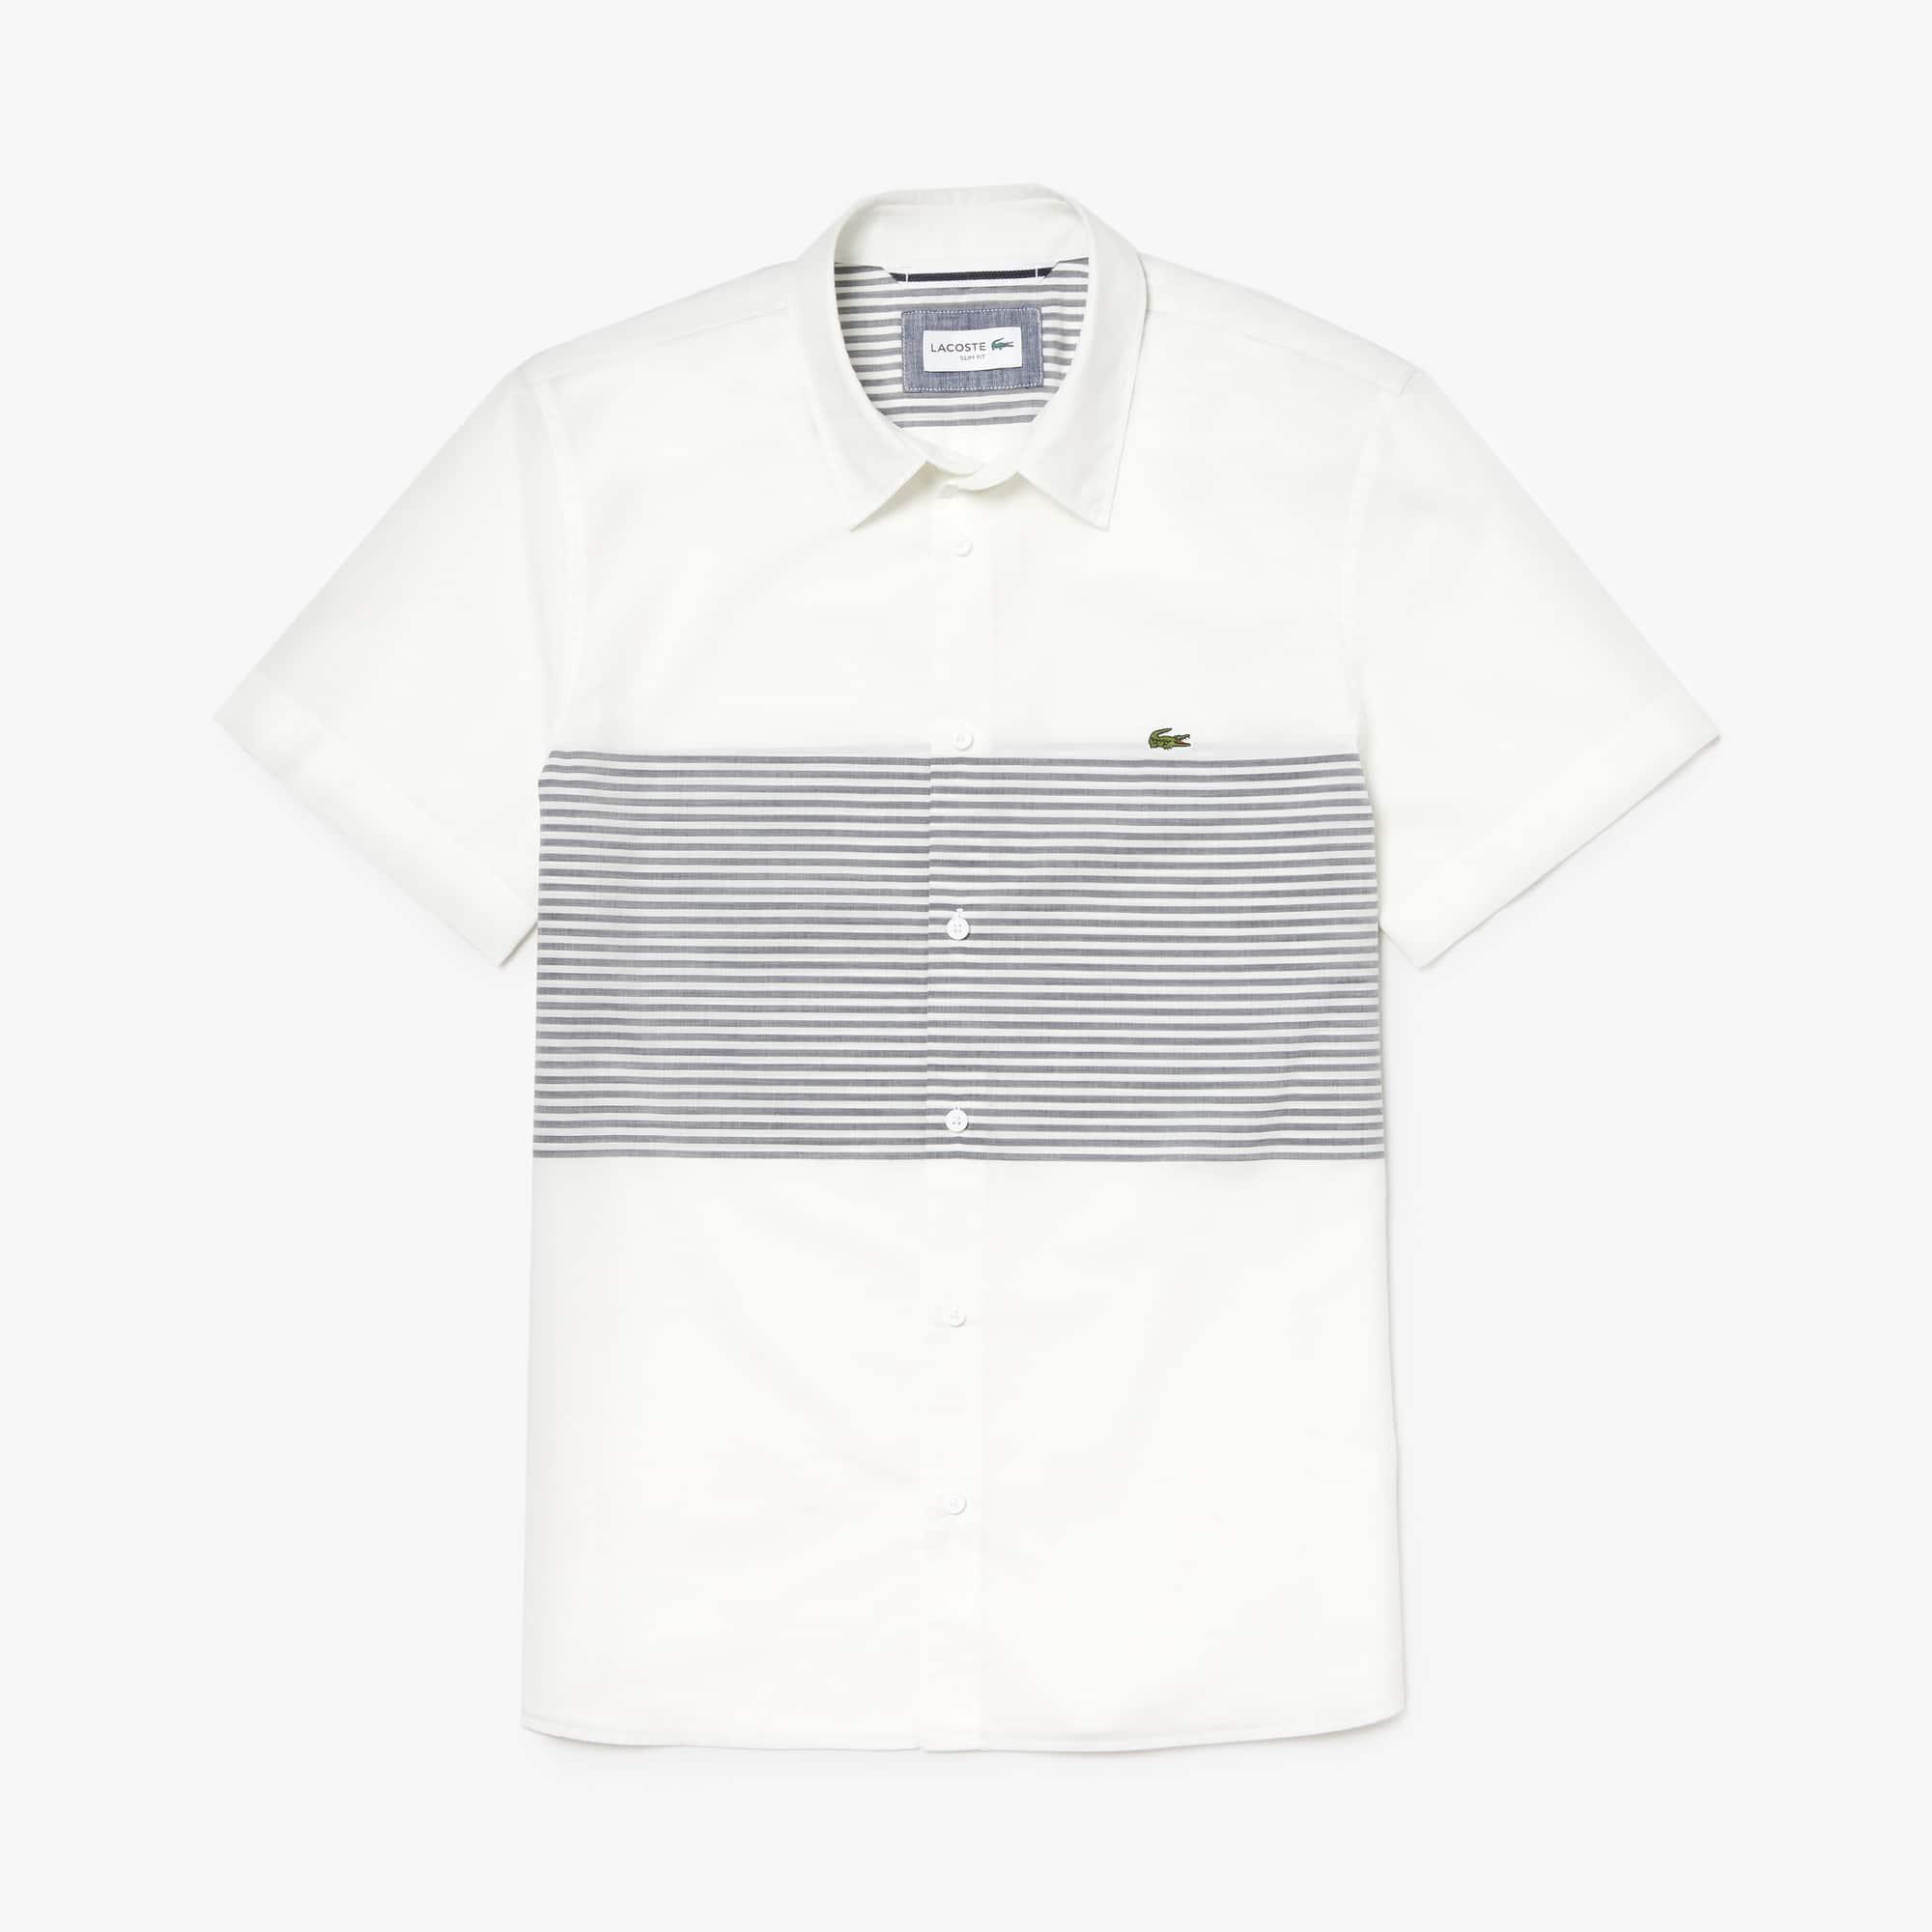 36c5c66eff Men's Slim Fit Cotton Poplin Shirt